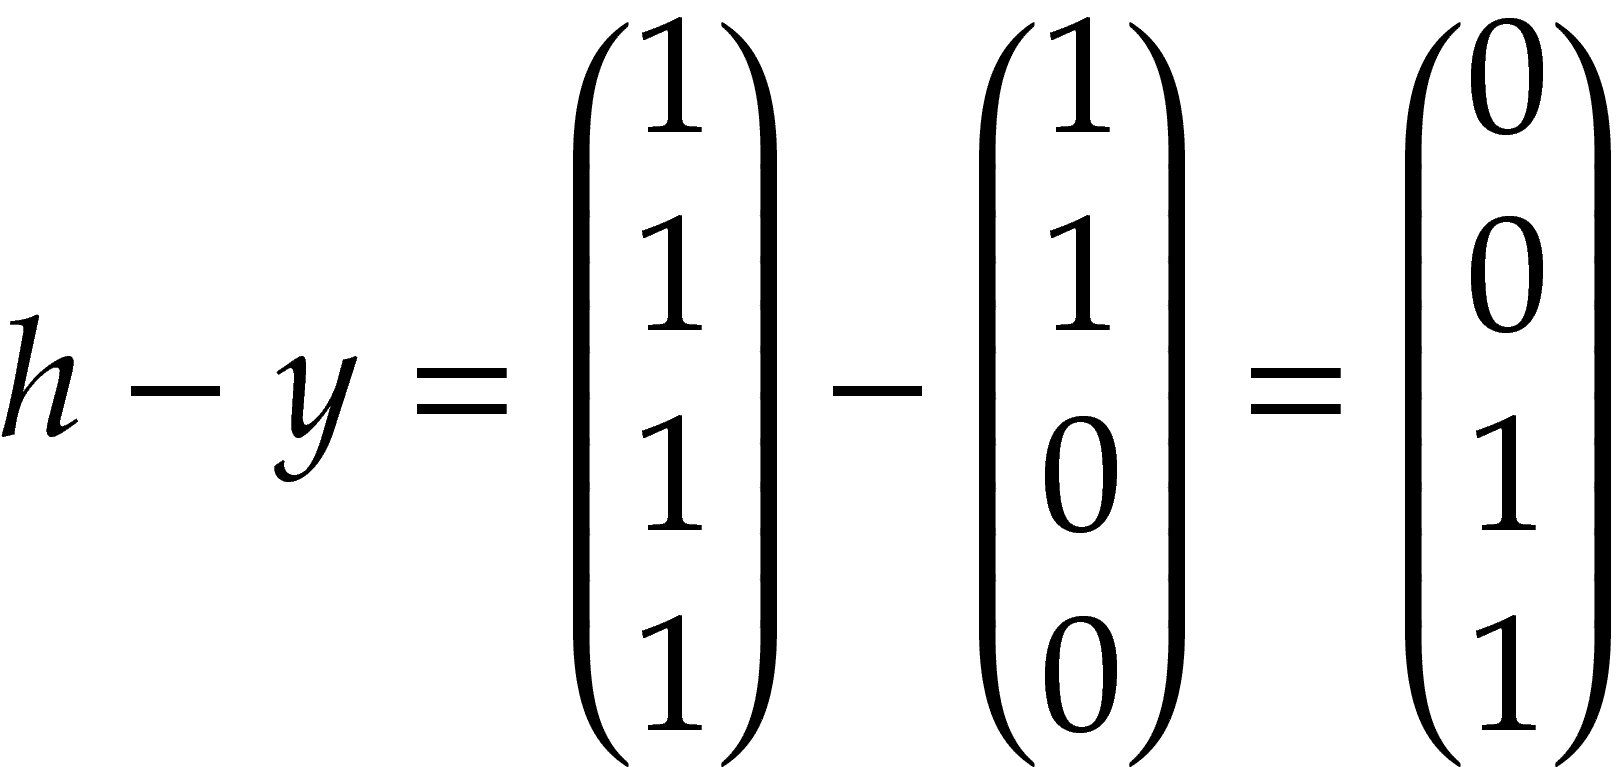 h - y = \begin{pmatrix} 1 \\ 1 \\ 1 \\ 1 \\ \end{pmatrix} - \begin{pmatrix} 1 \\ 1 \\ 0 \\ 0 \\ \end{pmatrix} = \begin{pmatrix} 0 \\ 0 \\ 1 \\ 1 \\ \end{pmatrix}